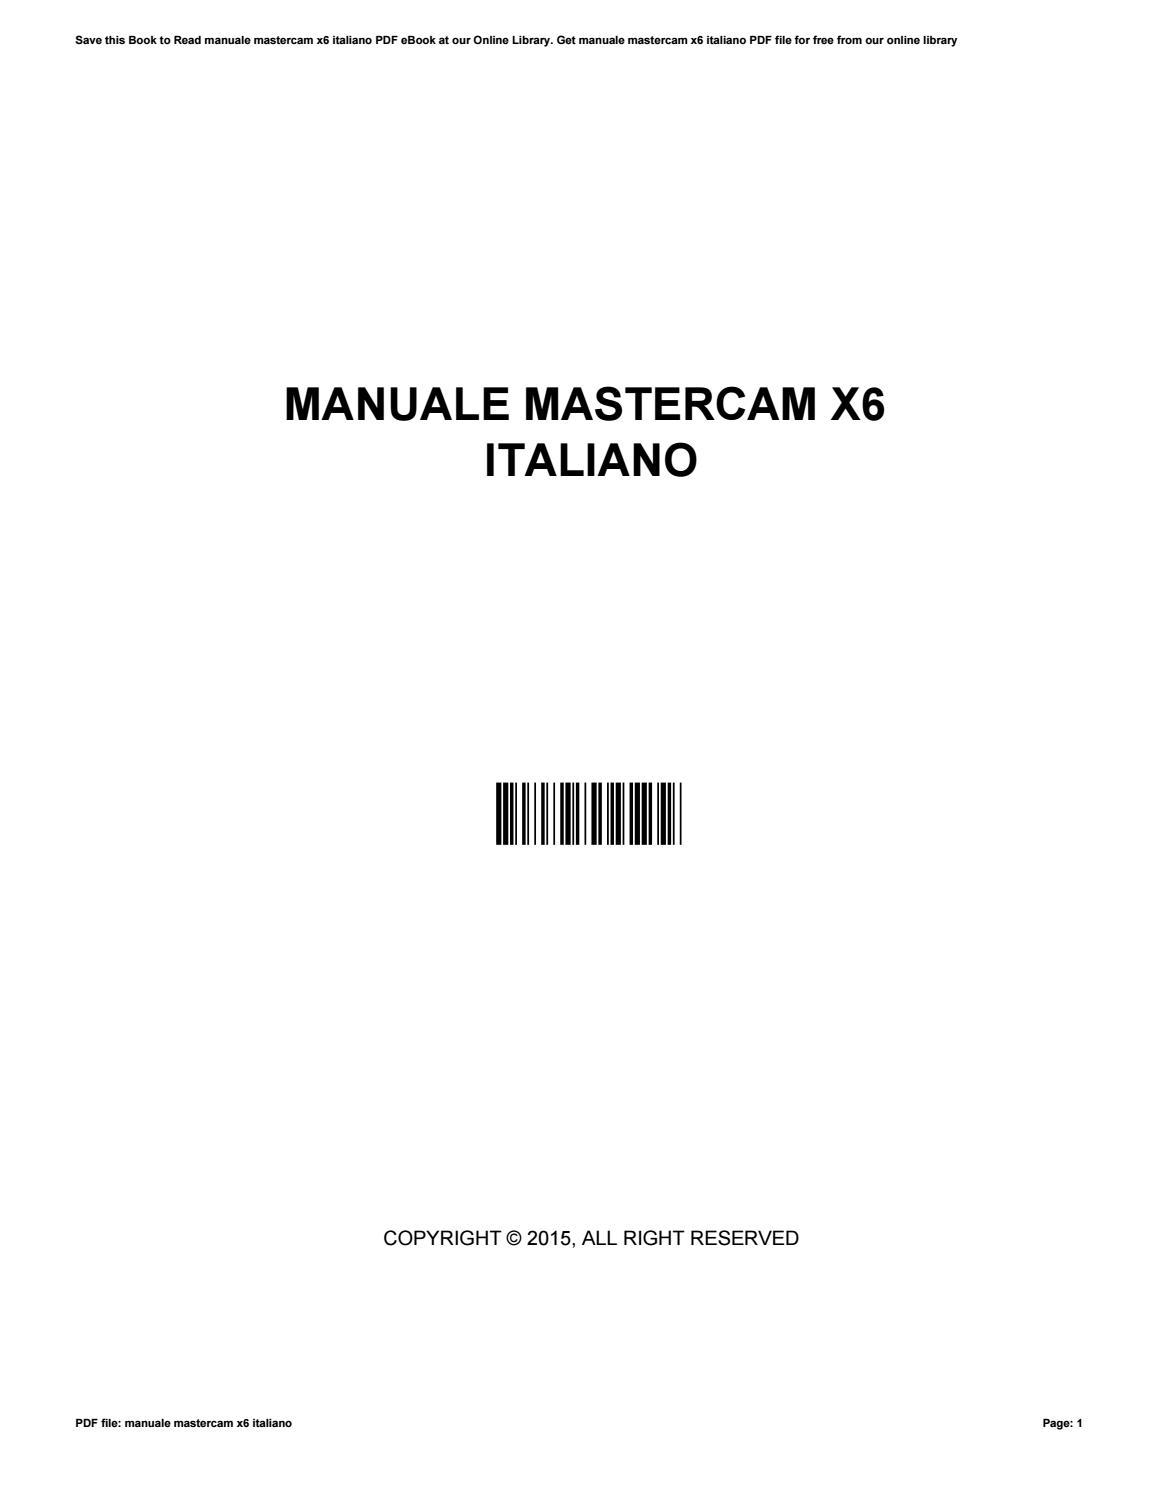 manuale master cam browse manual guides u2022 rh trufflefries co